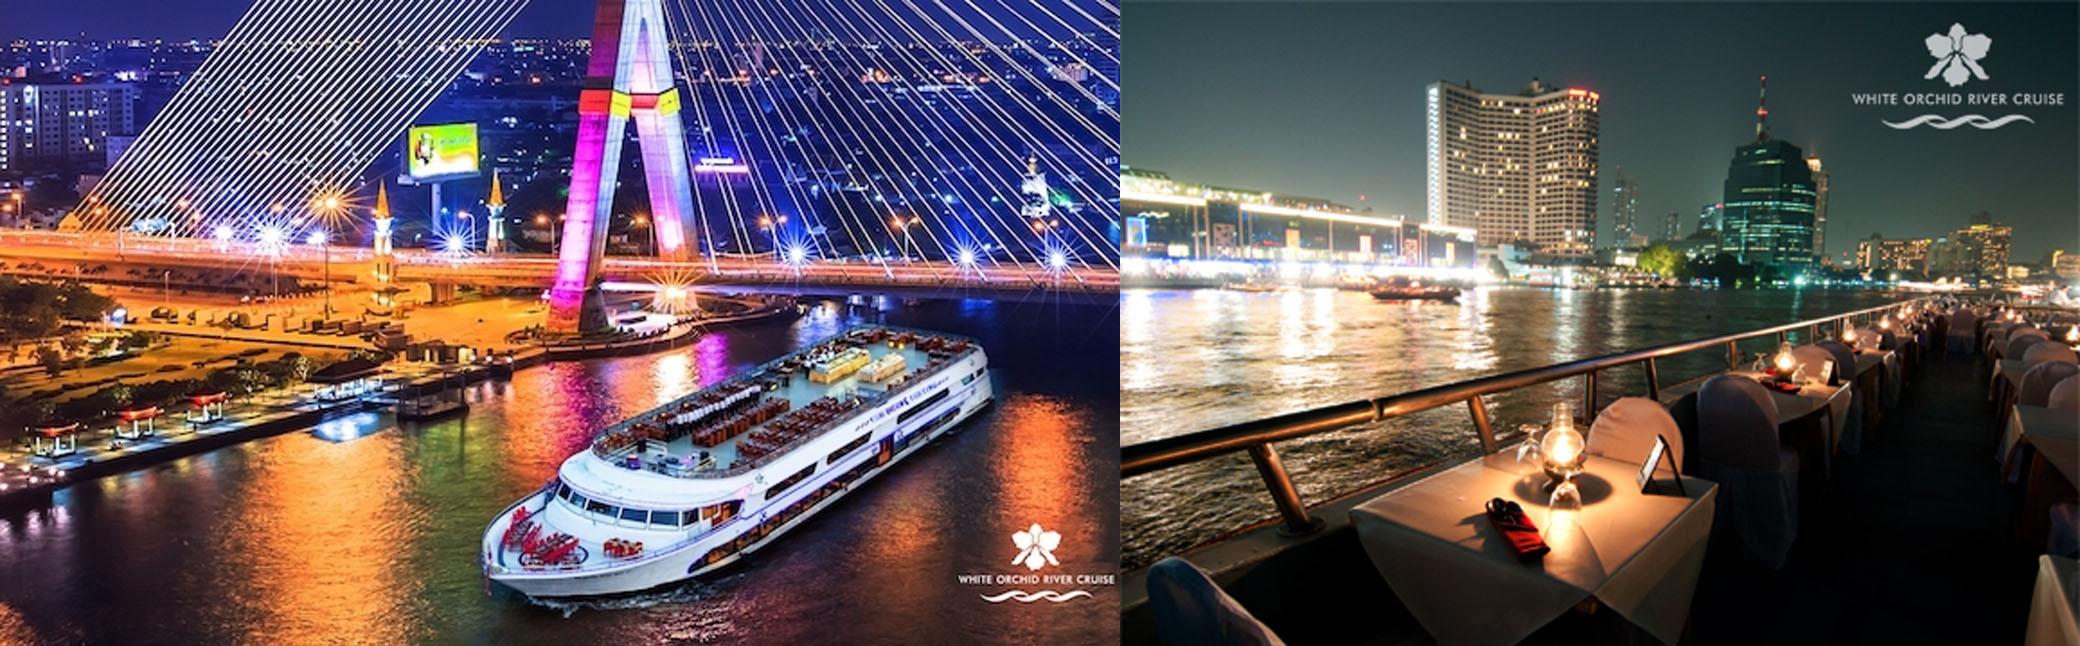 White Orchid River Cruise ล่องเรือแม่น้ำเจ้าพระยา ดินเนอร์  Seafood Buffet by เรือสำราญ [2564]